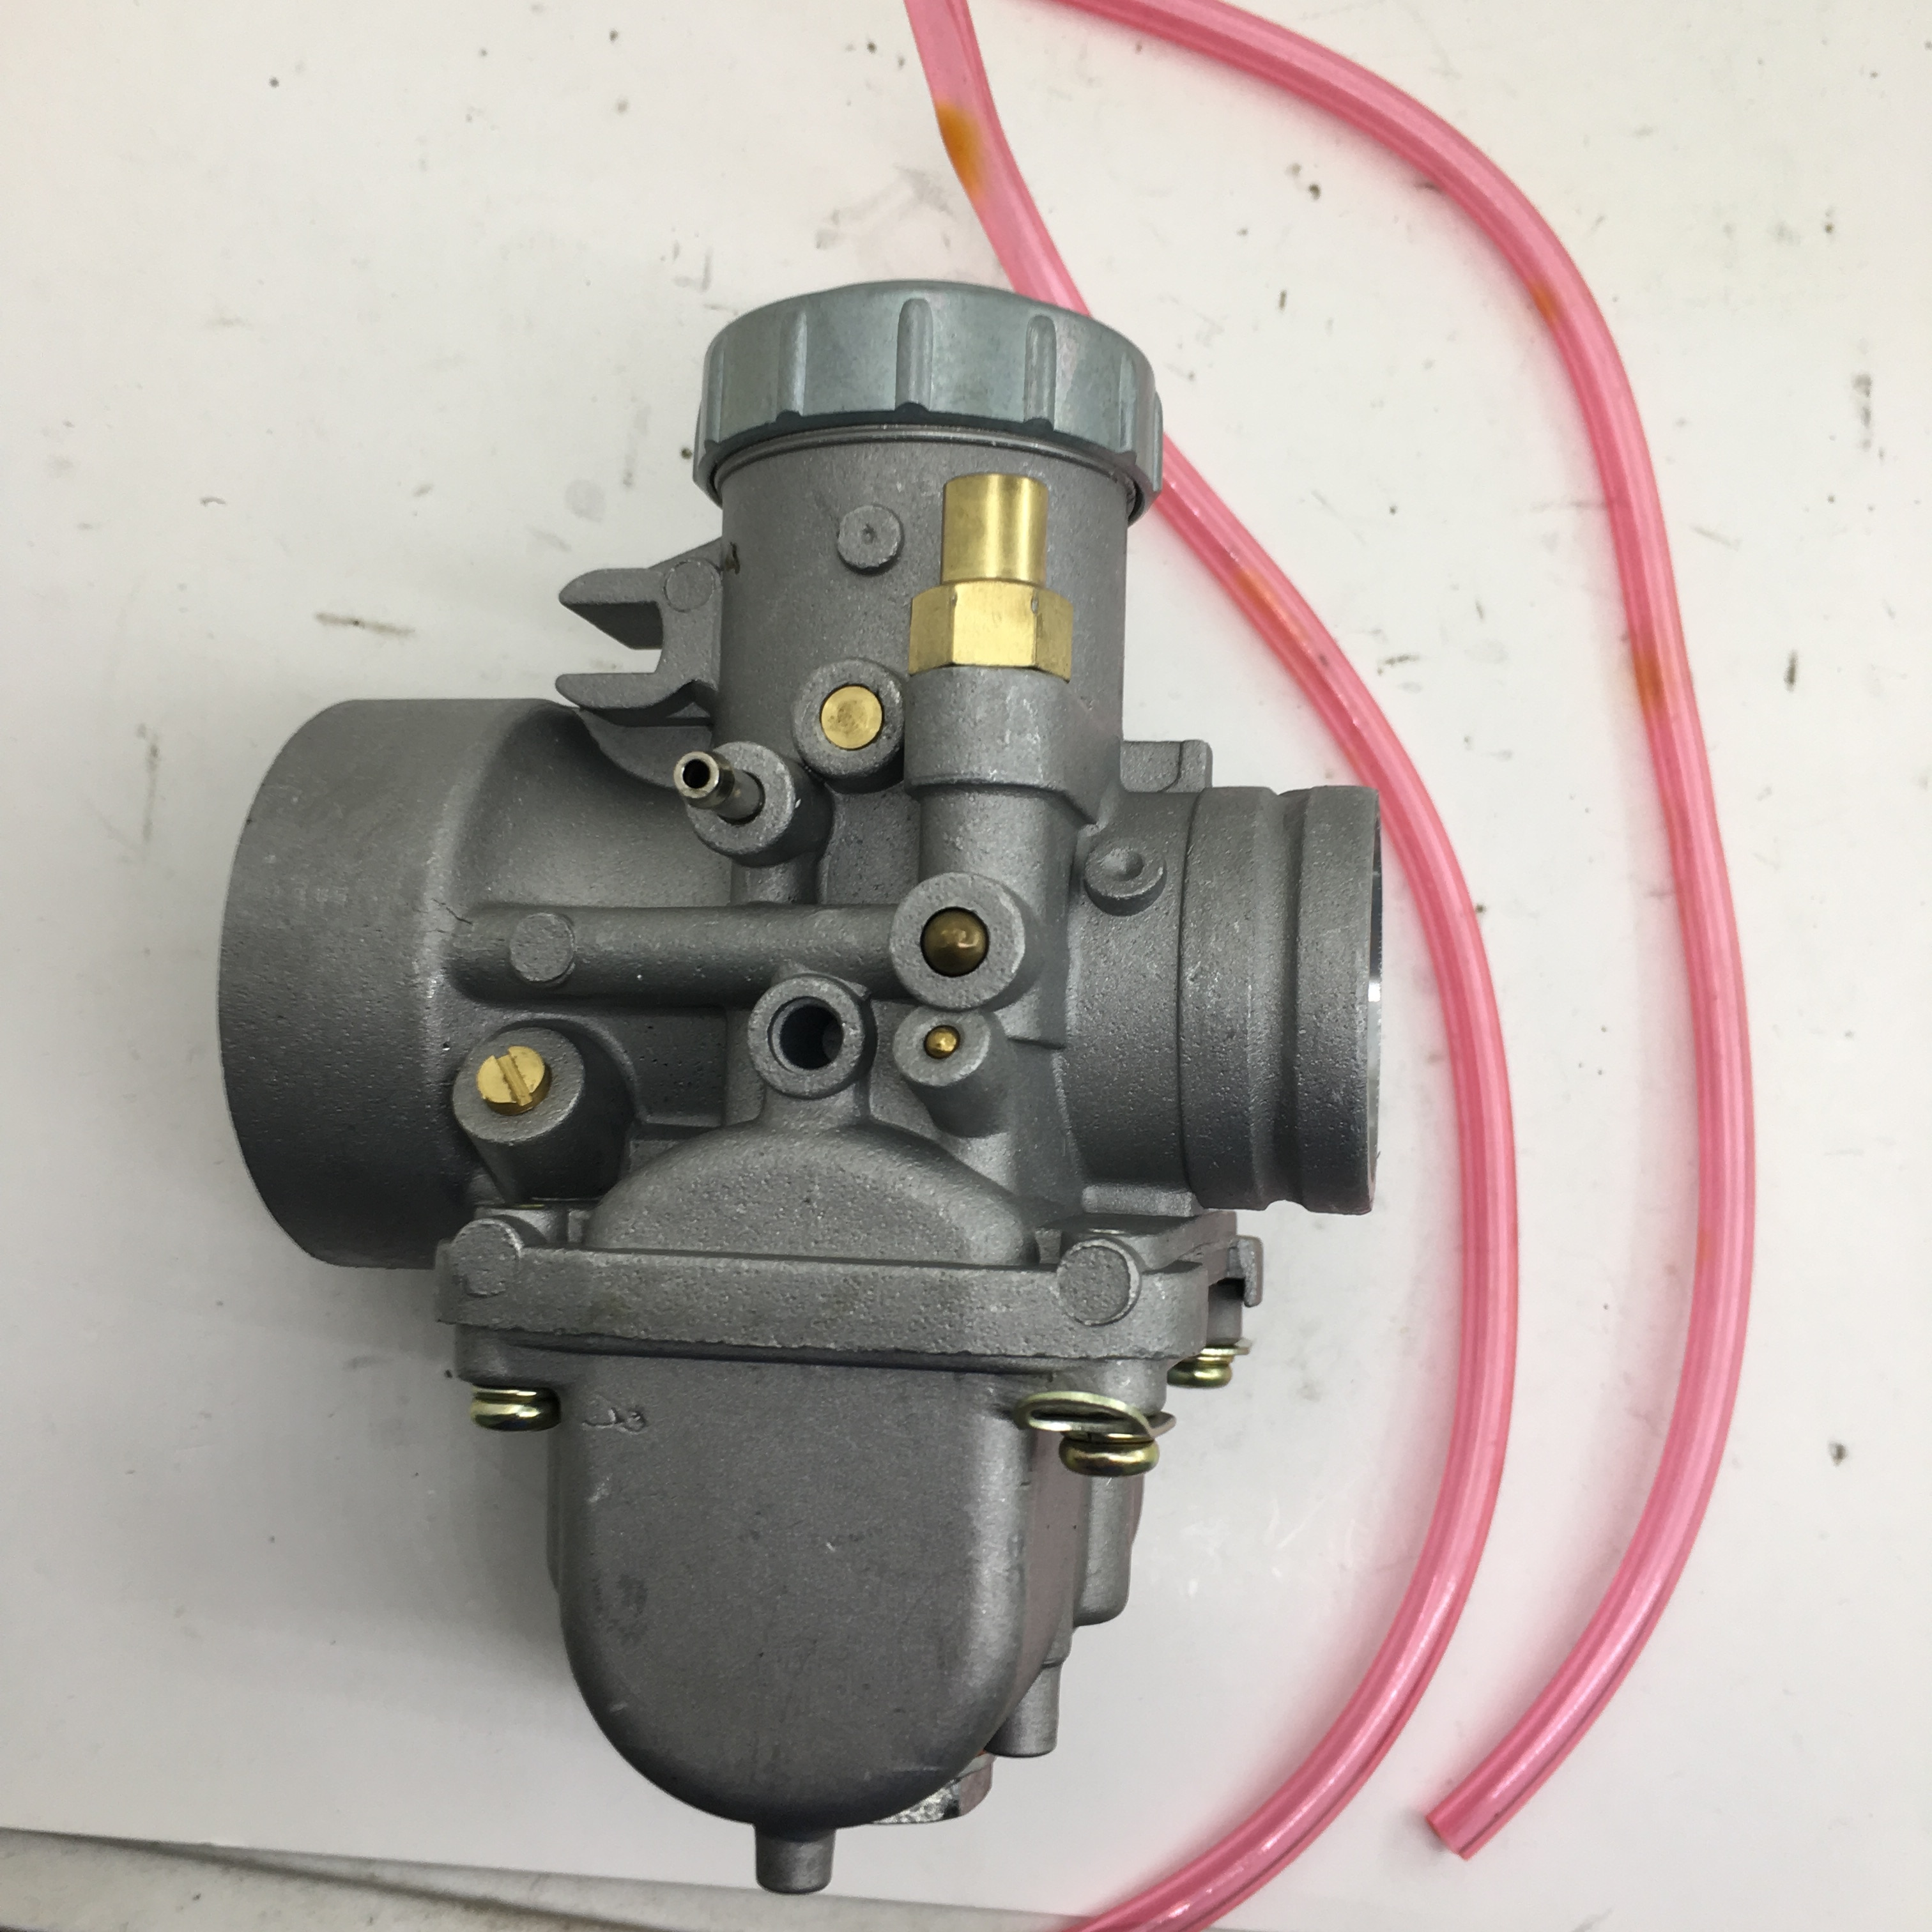 SherryBerg carburador para Mikuni VM 34 mm 34MM AUTO choque ronda diapositiva VM34SC VM34-168 42-6015 nuevo vergaser